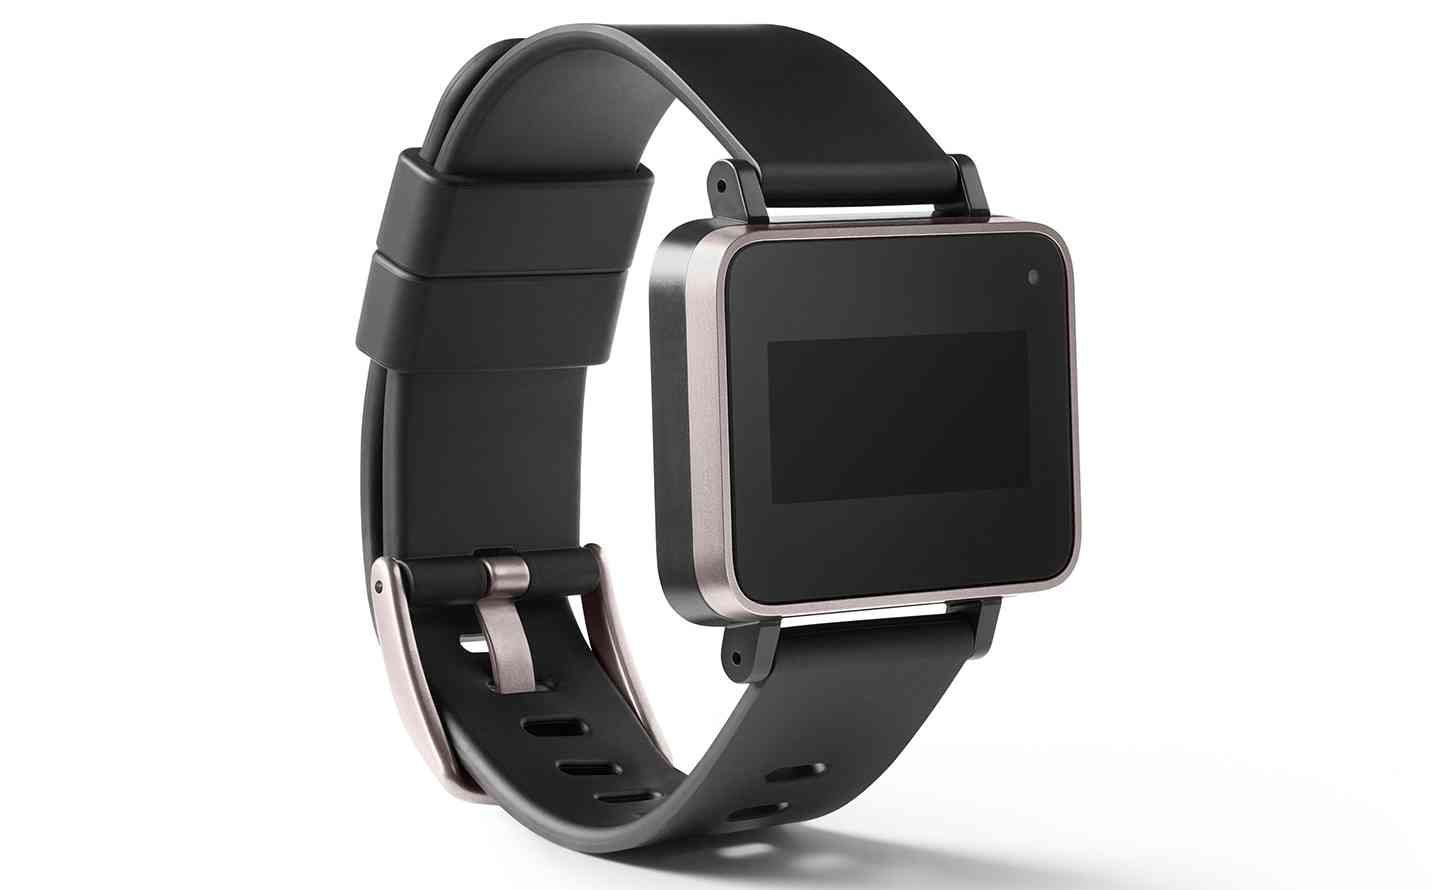 Google health-tracking wristband large